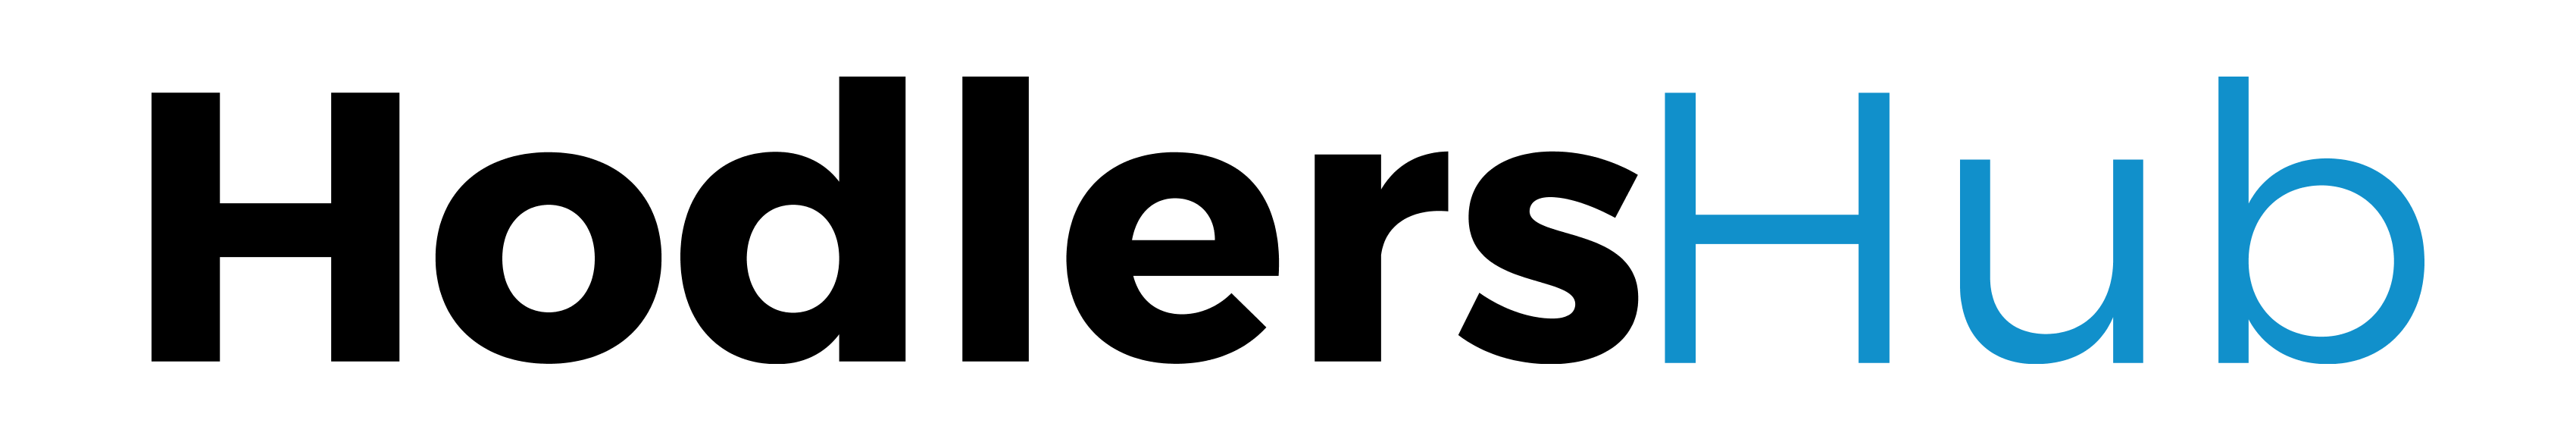 Horizen: Building the World's Most Secure Interoperable Blockchain Ecosystem - HodlersHub